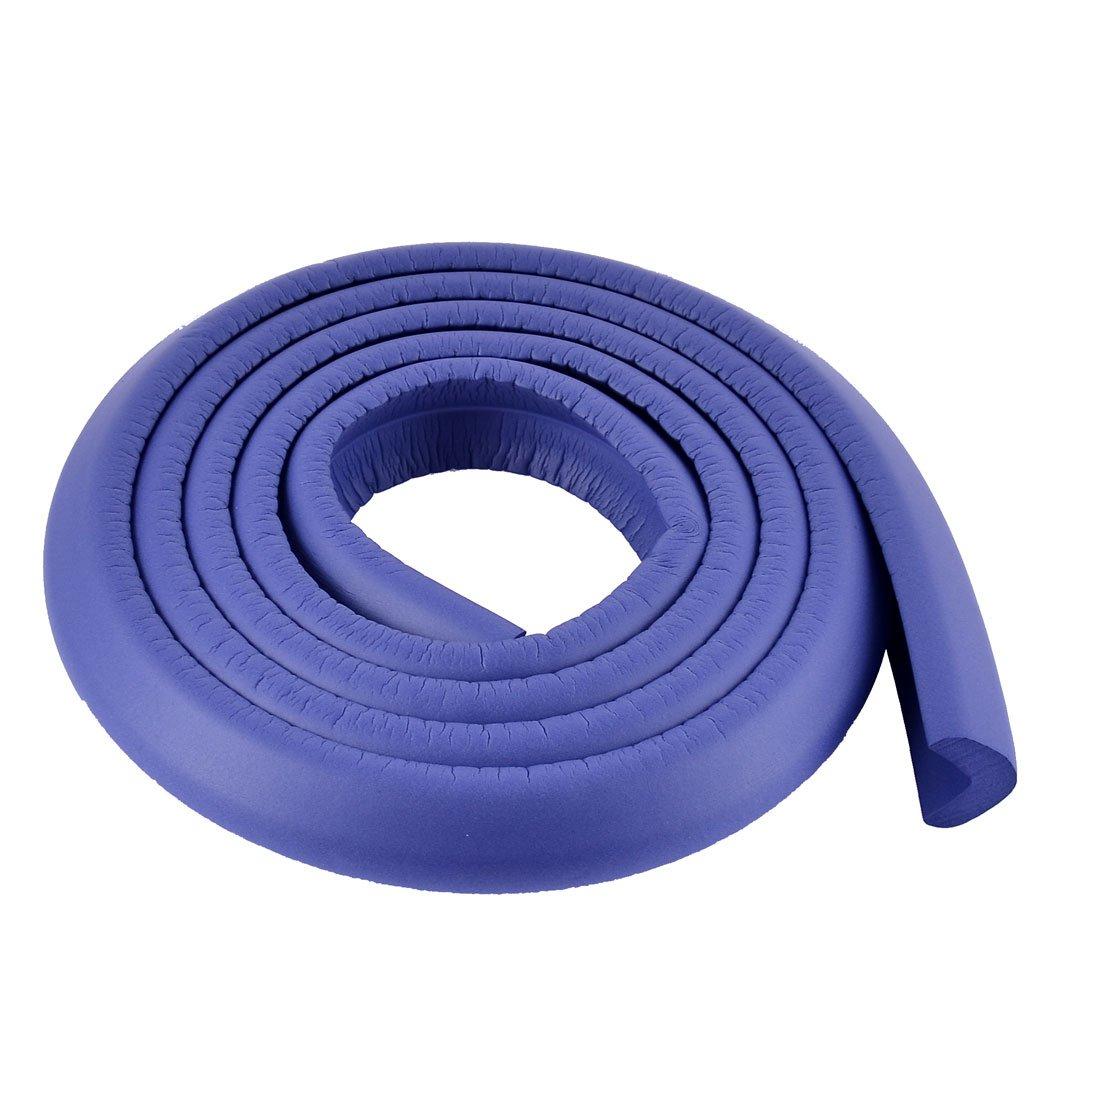 uxcell Furniture Corner Edge Softner Guard Protector Cushion 2M Long Blue